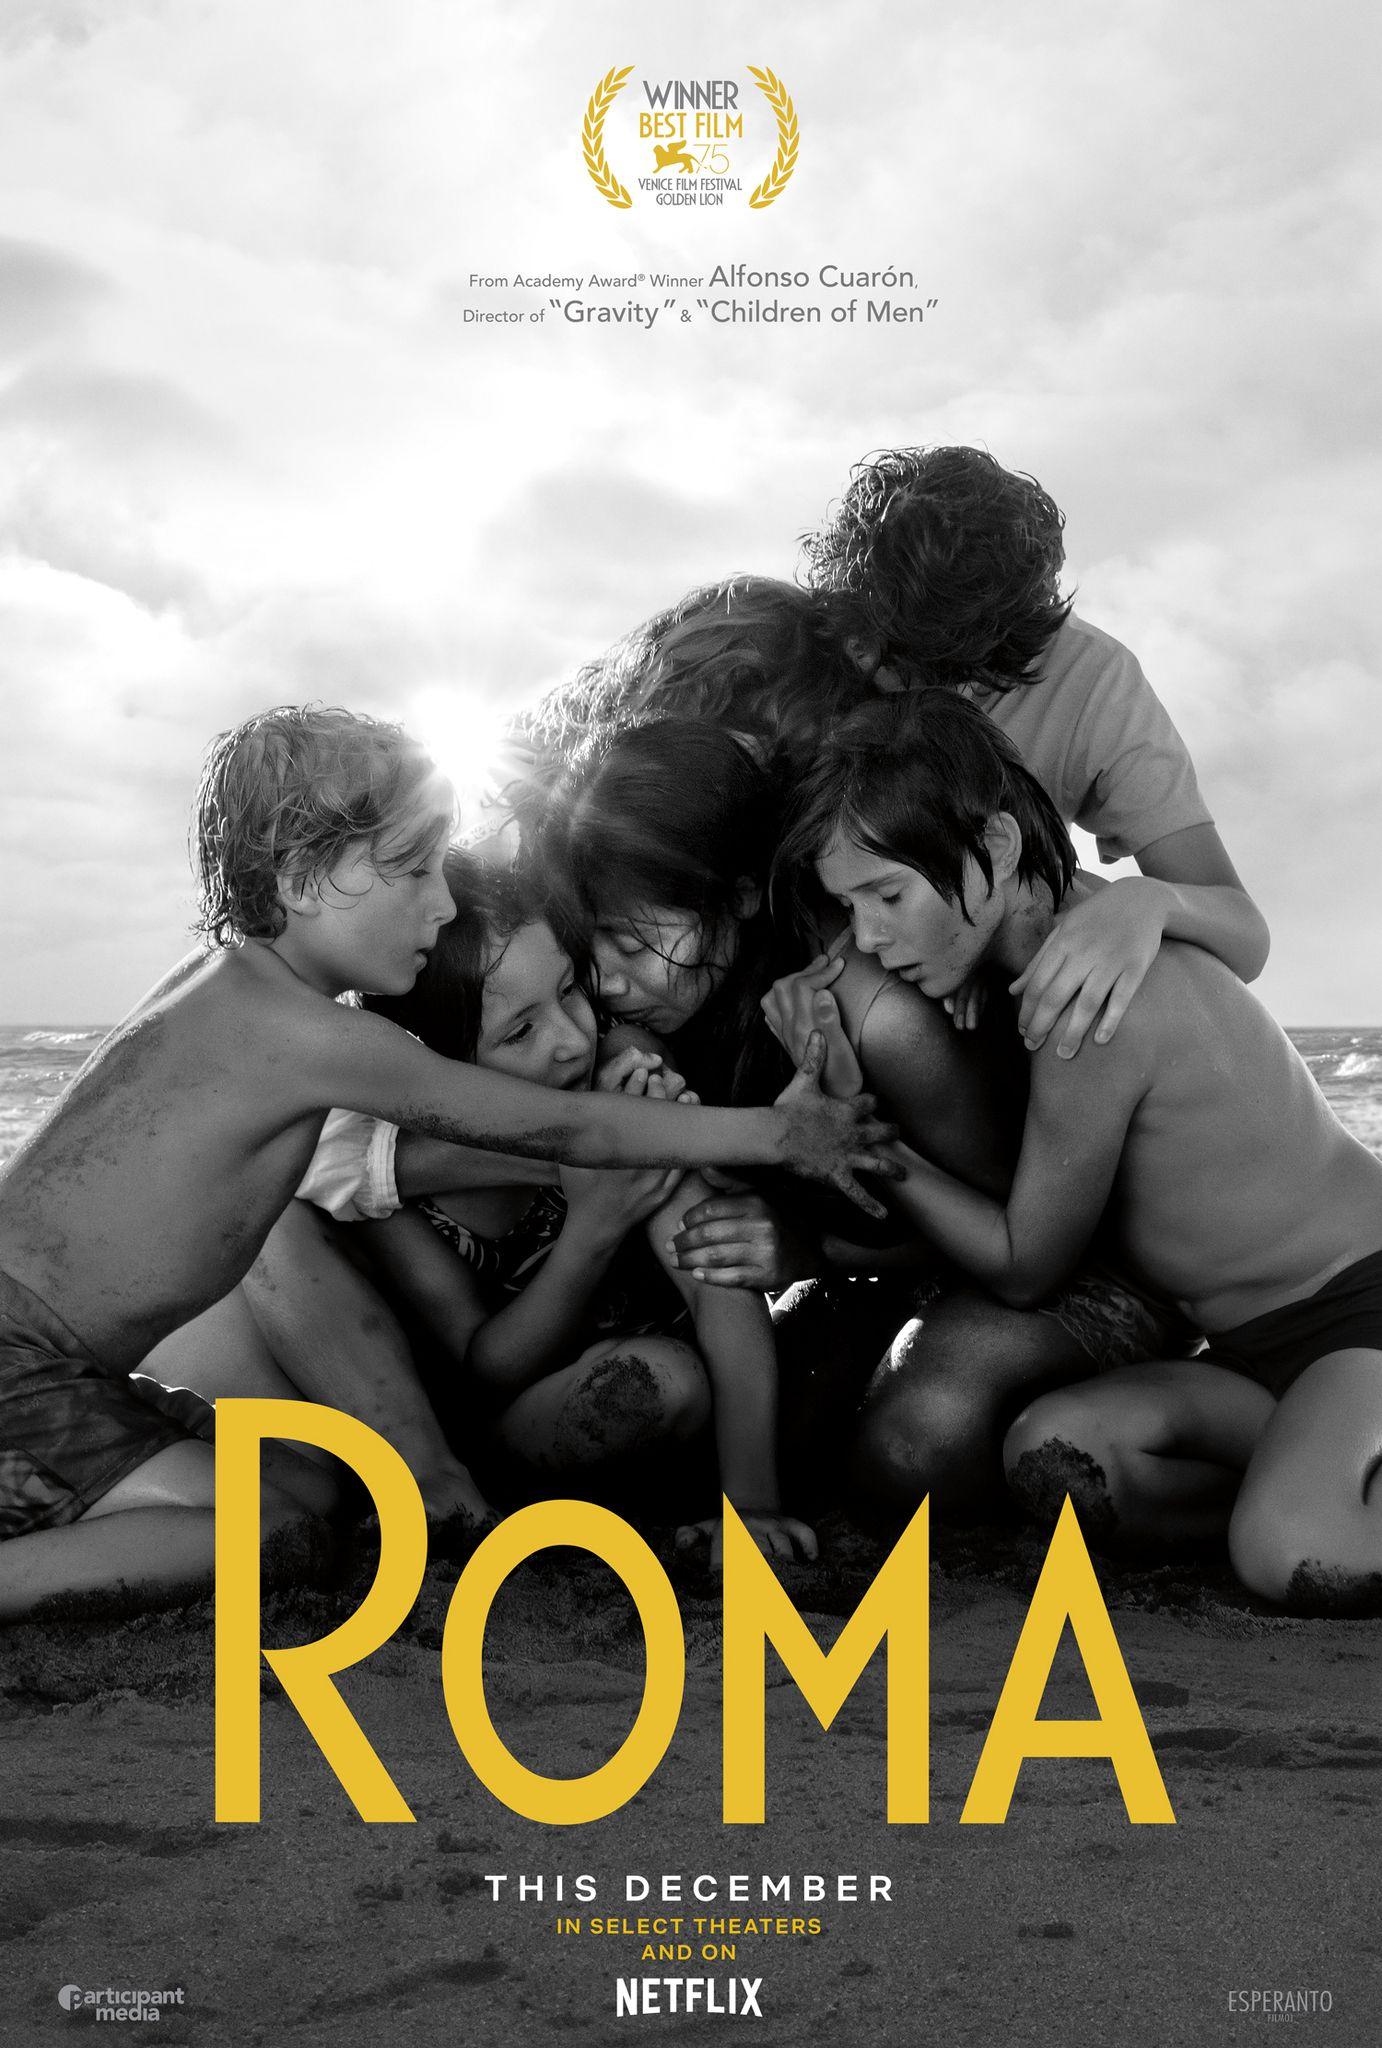 羅馬|Roma|#135min/2018 |#AlfonsoCuarón #YalitzaAparicio #MarinadeTavira  #DiegoCortina Autrey |#Drama #Mexico | USA #Movie #Poster